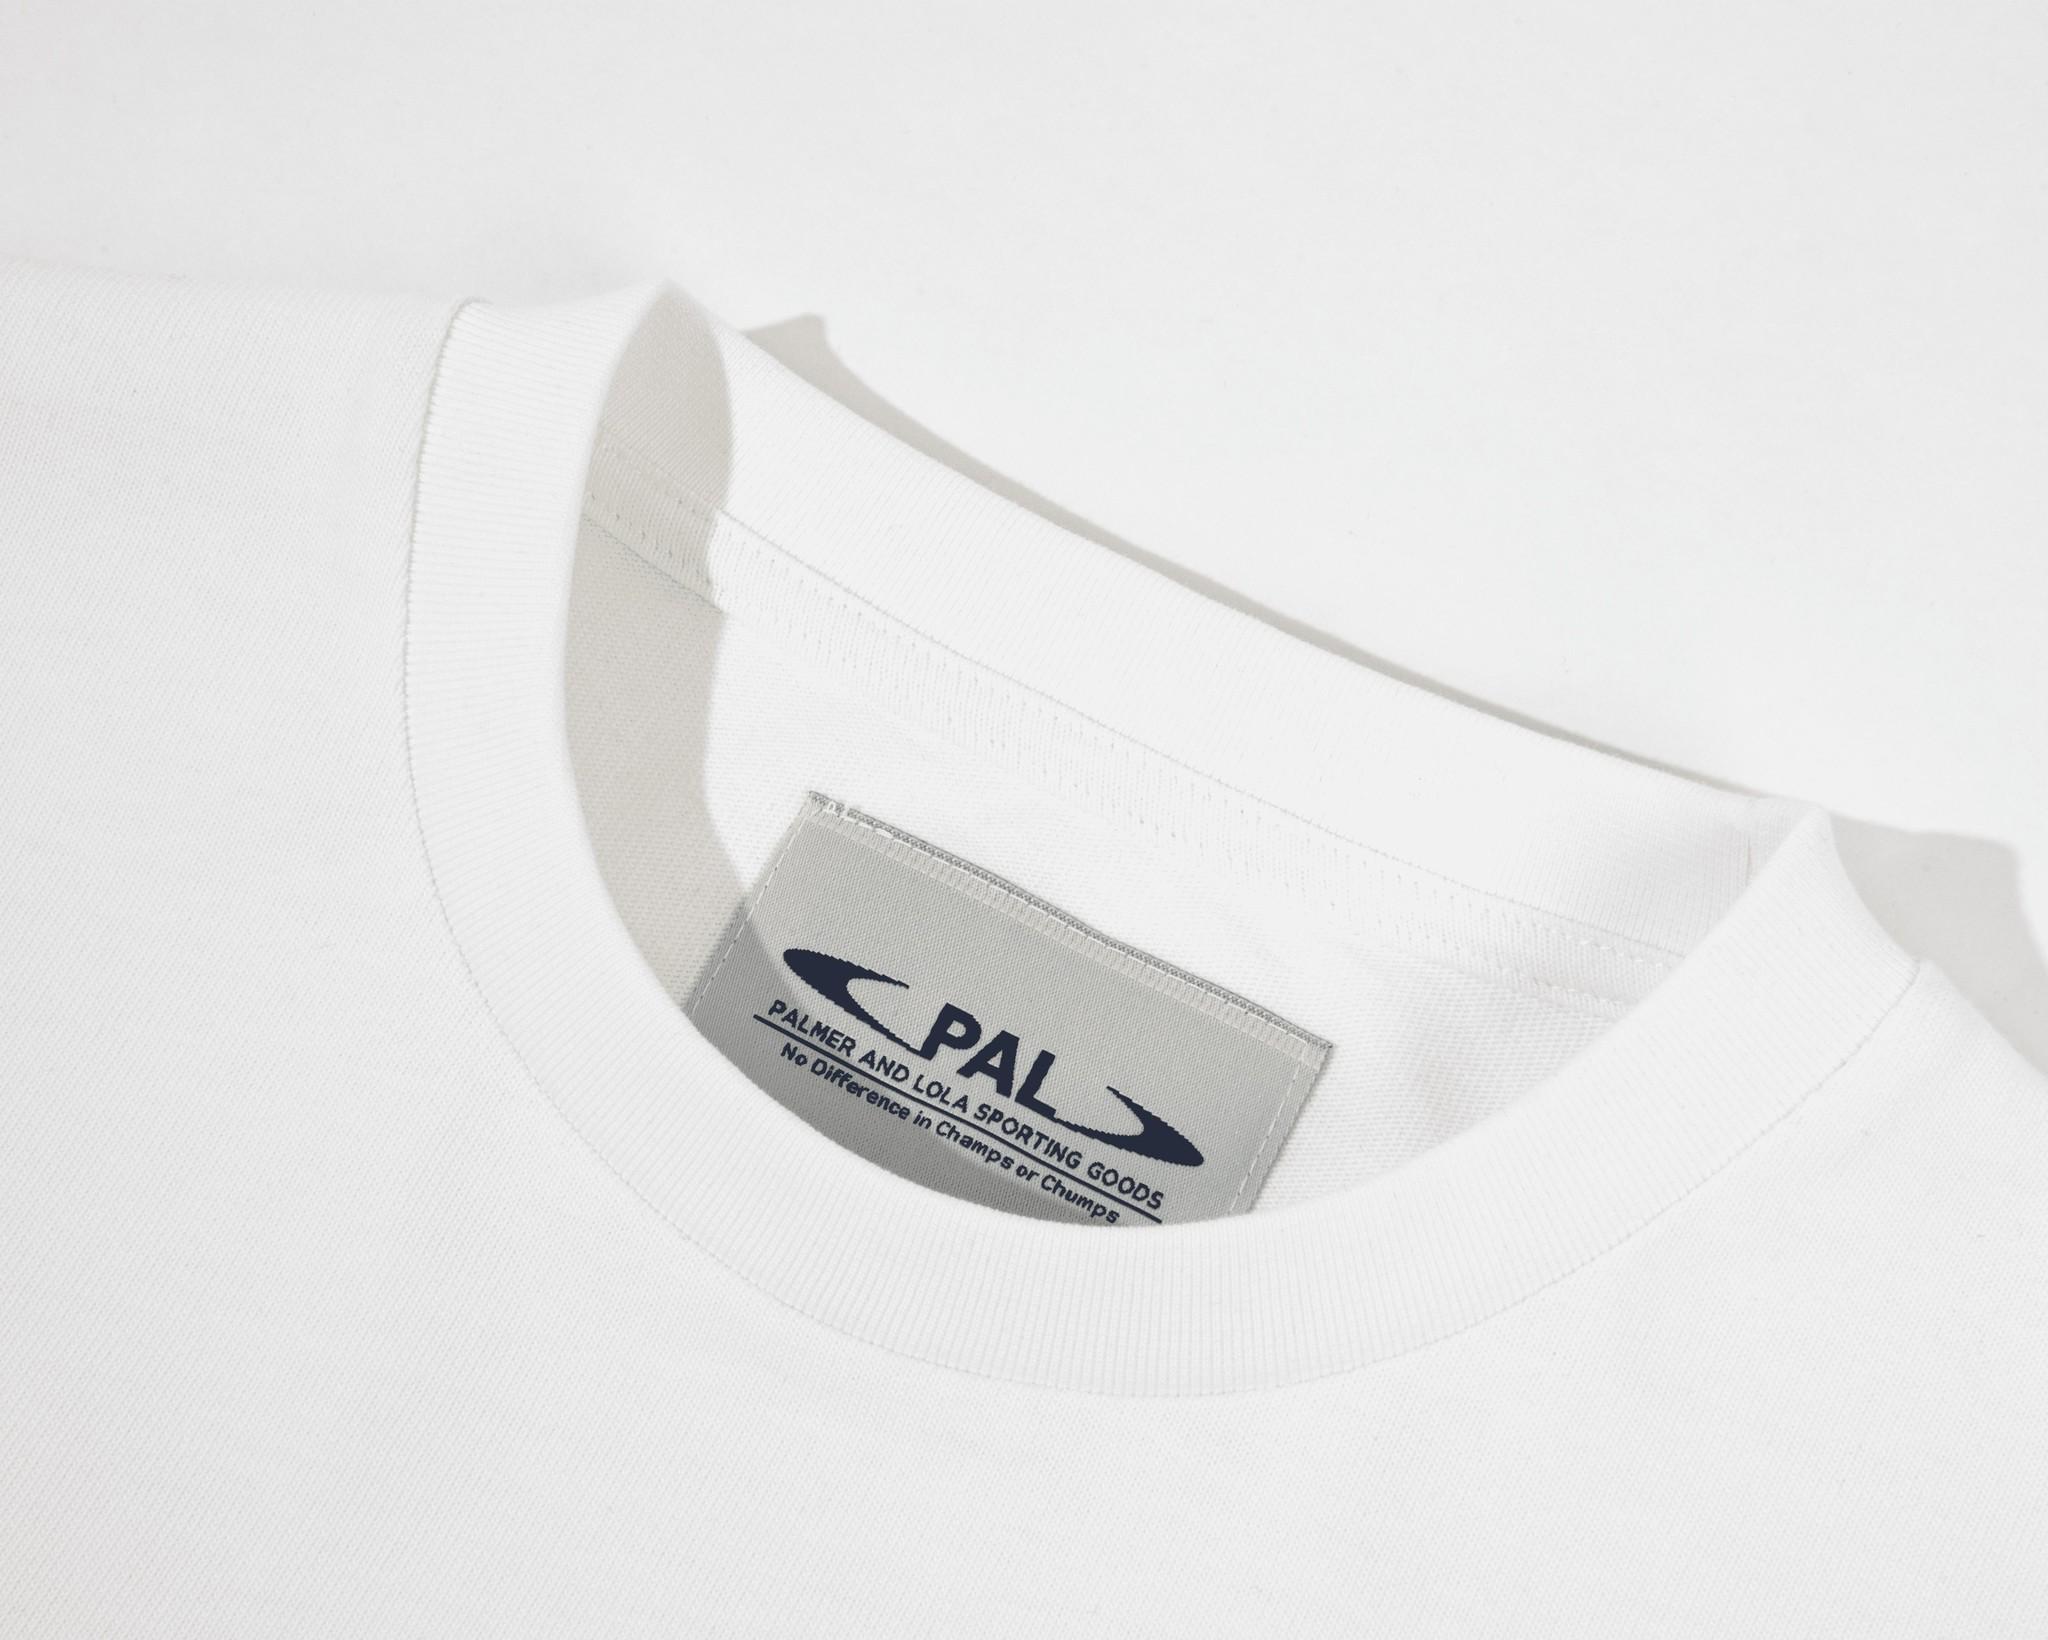 PAL Broadcast logo tshirt off the grid white